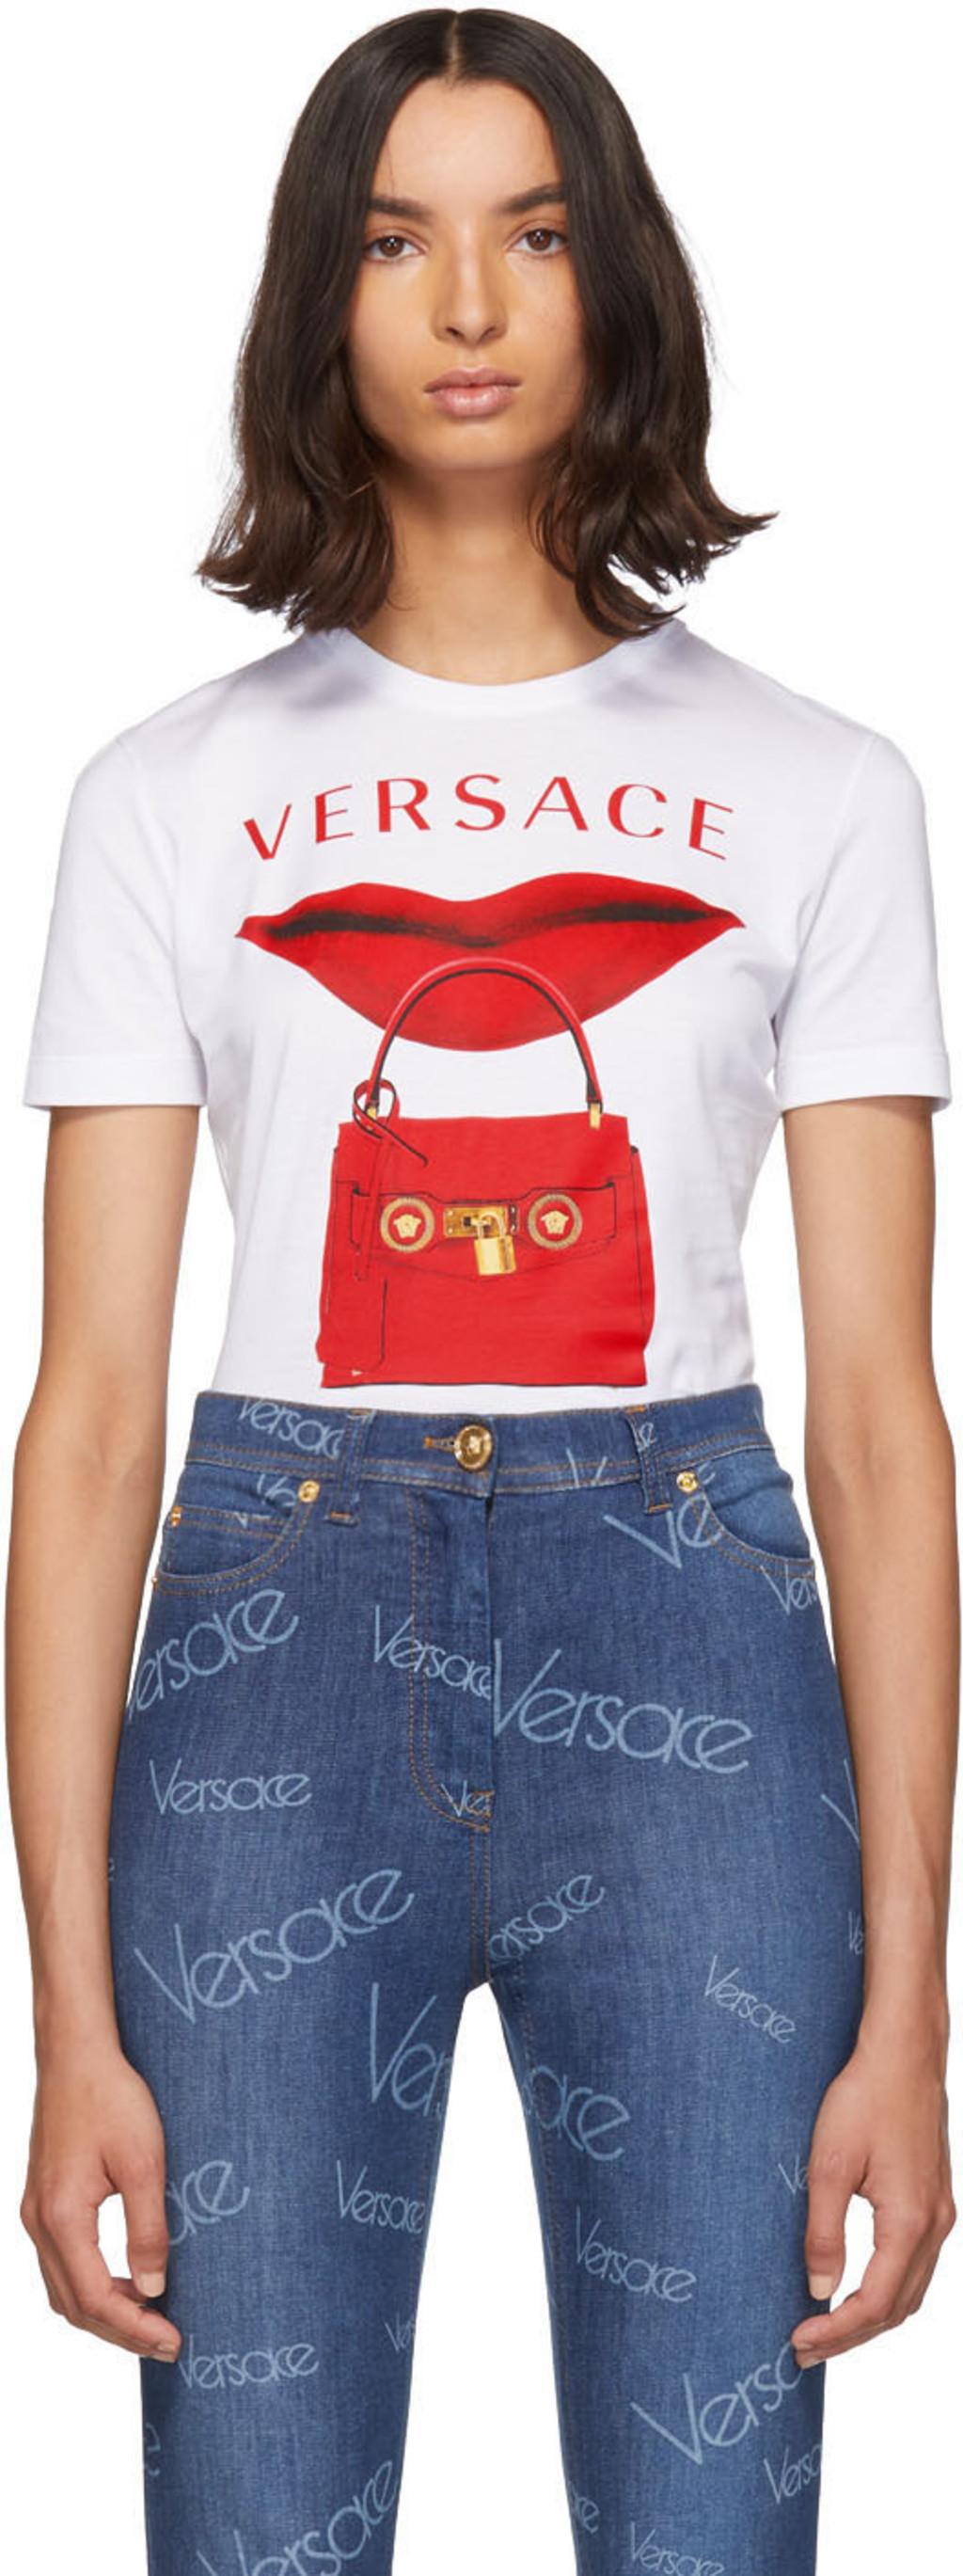 80a915ff9e White Lip Bag T-Shirt